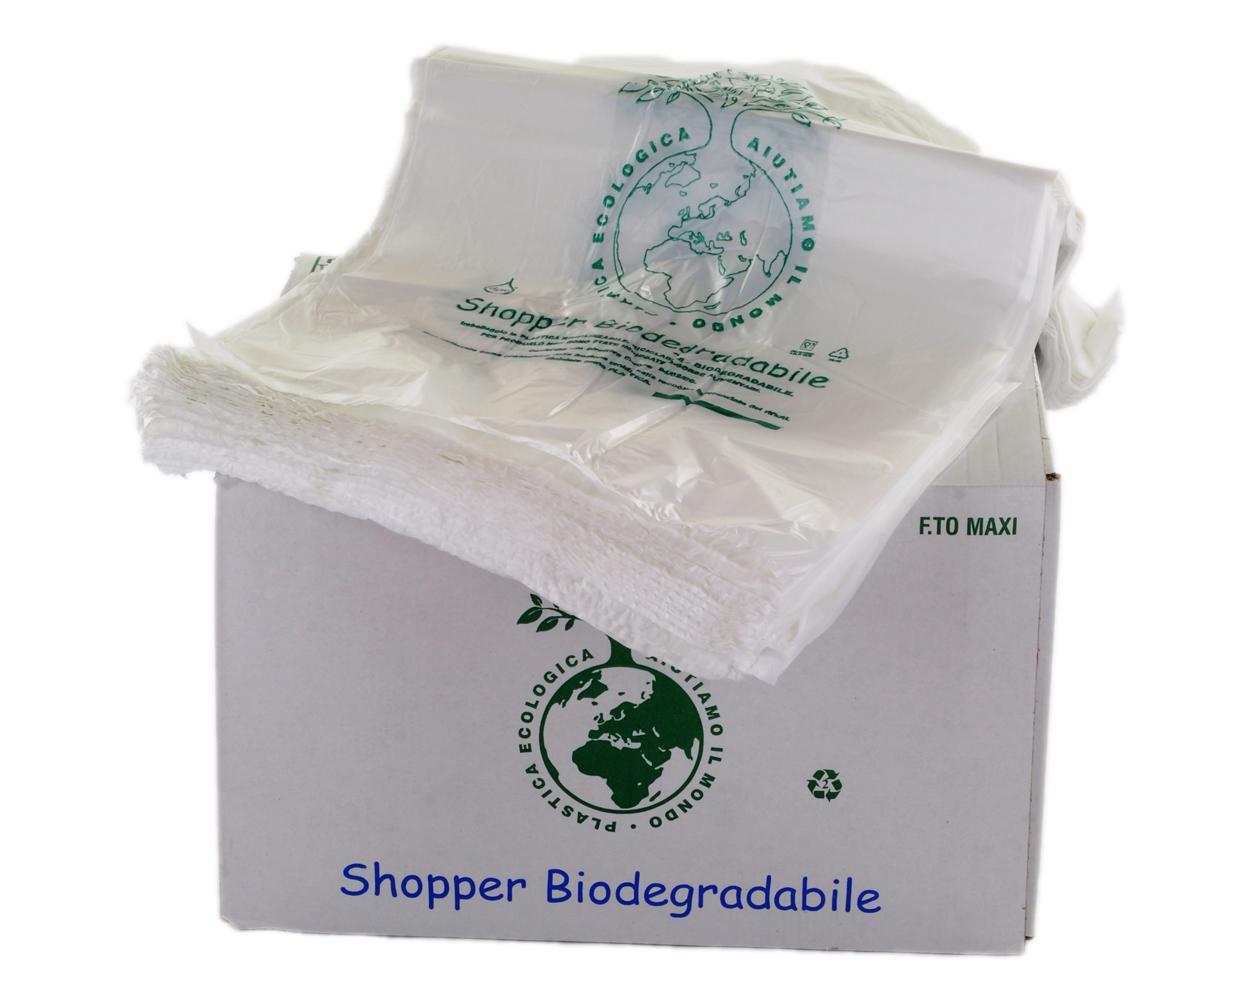 sacchetti e shopper biodegradabili compostabili cosa